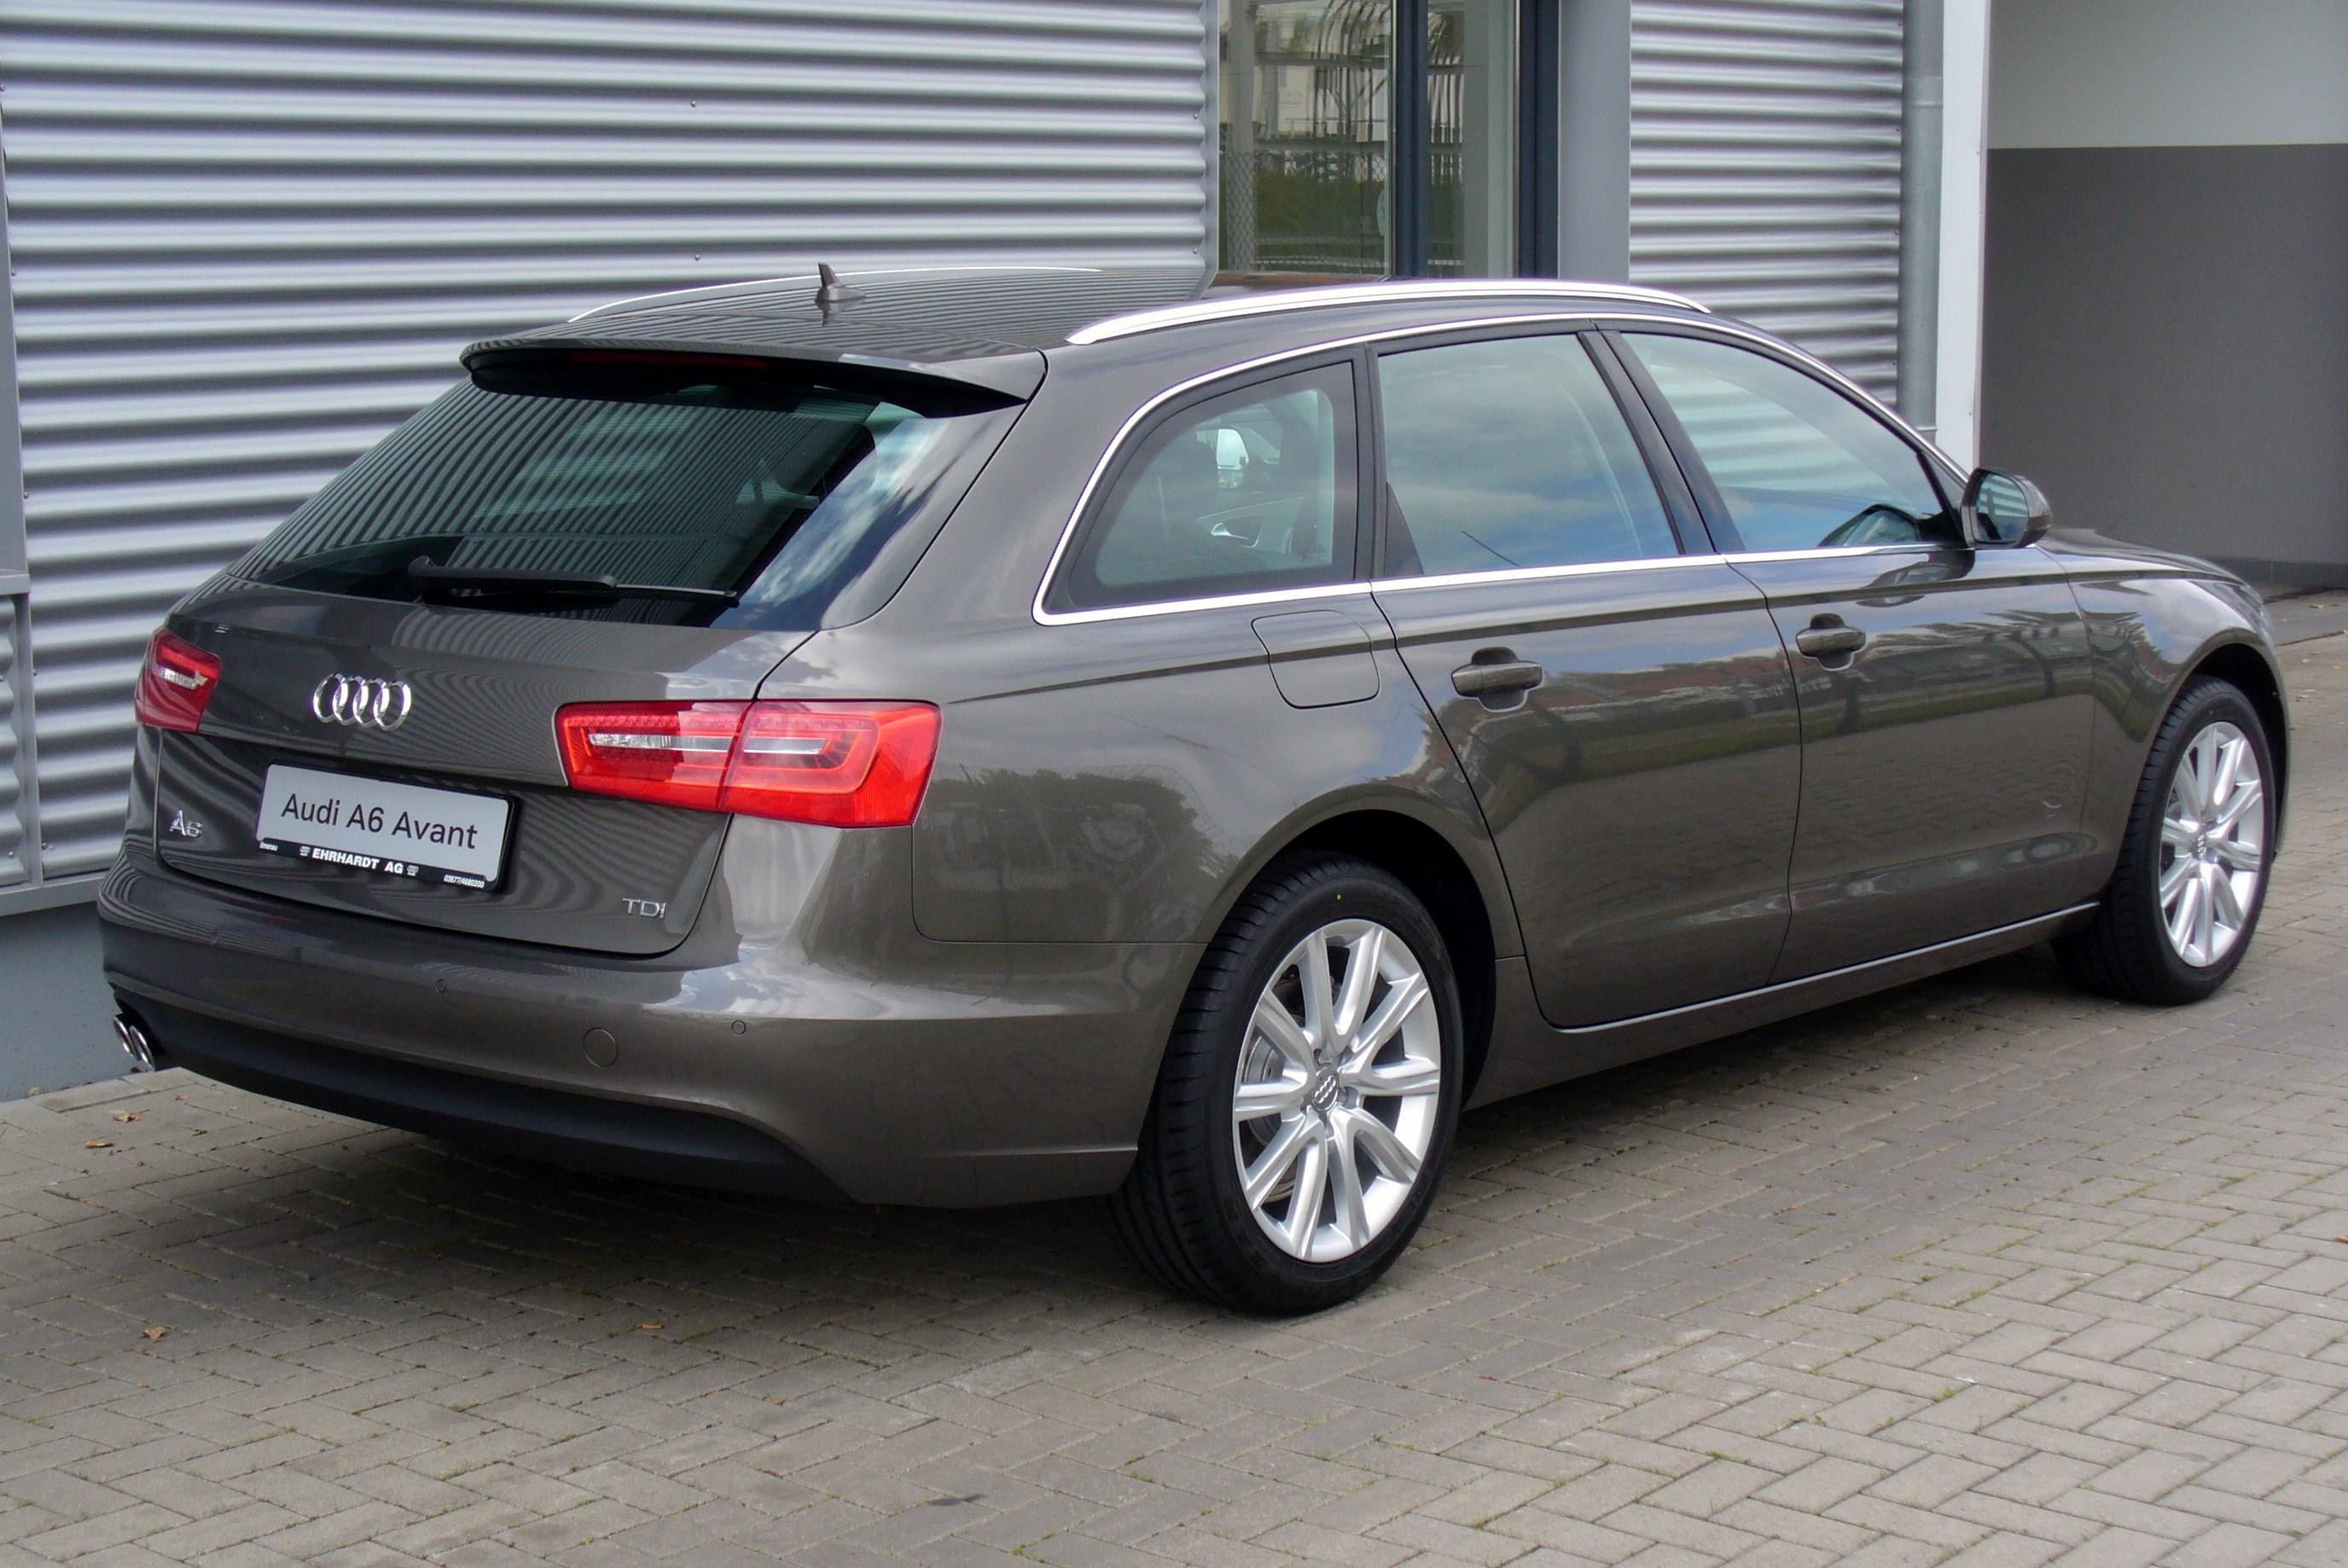 File Audi A6 Avant 2 0 Tdi Dakotagrau Seite Jpg Wikimedia Commons